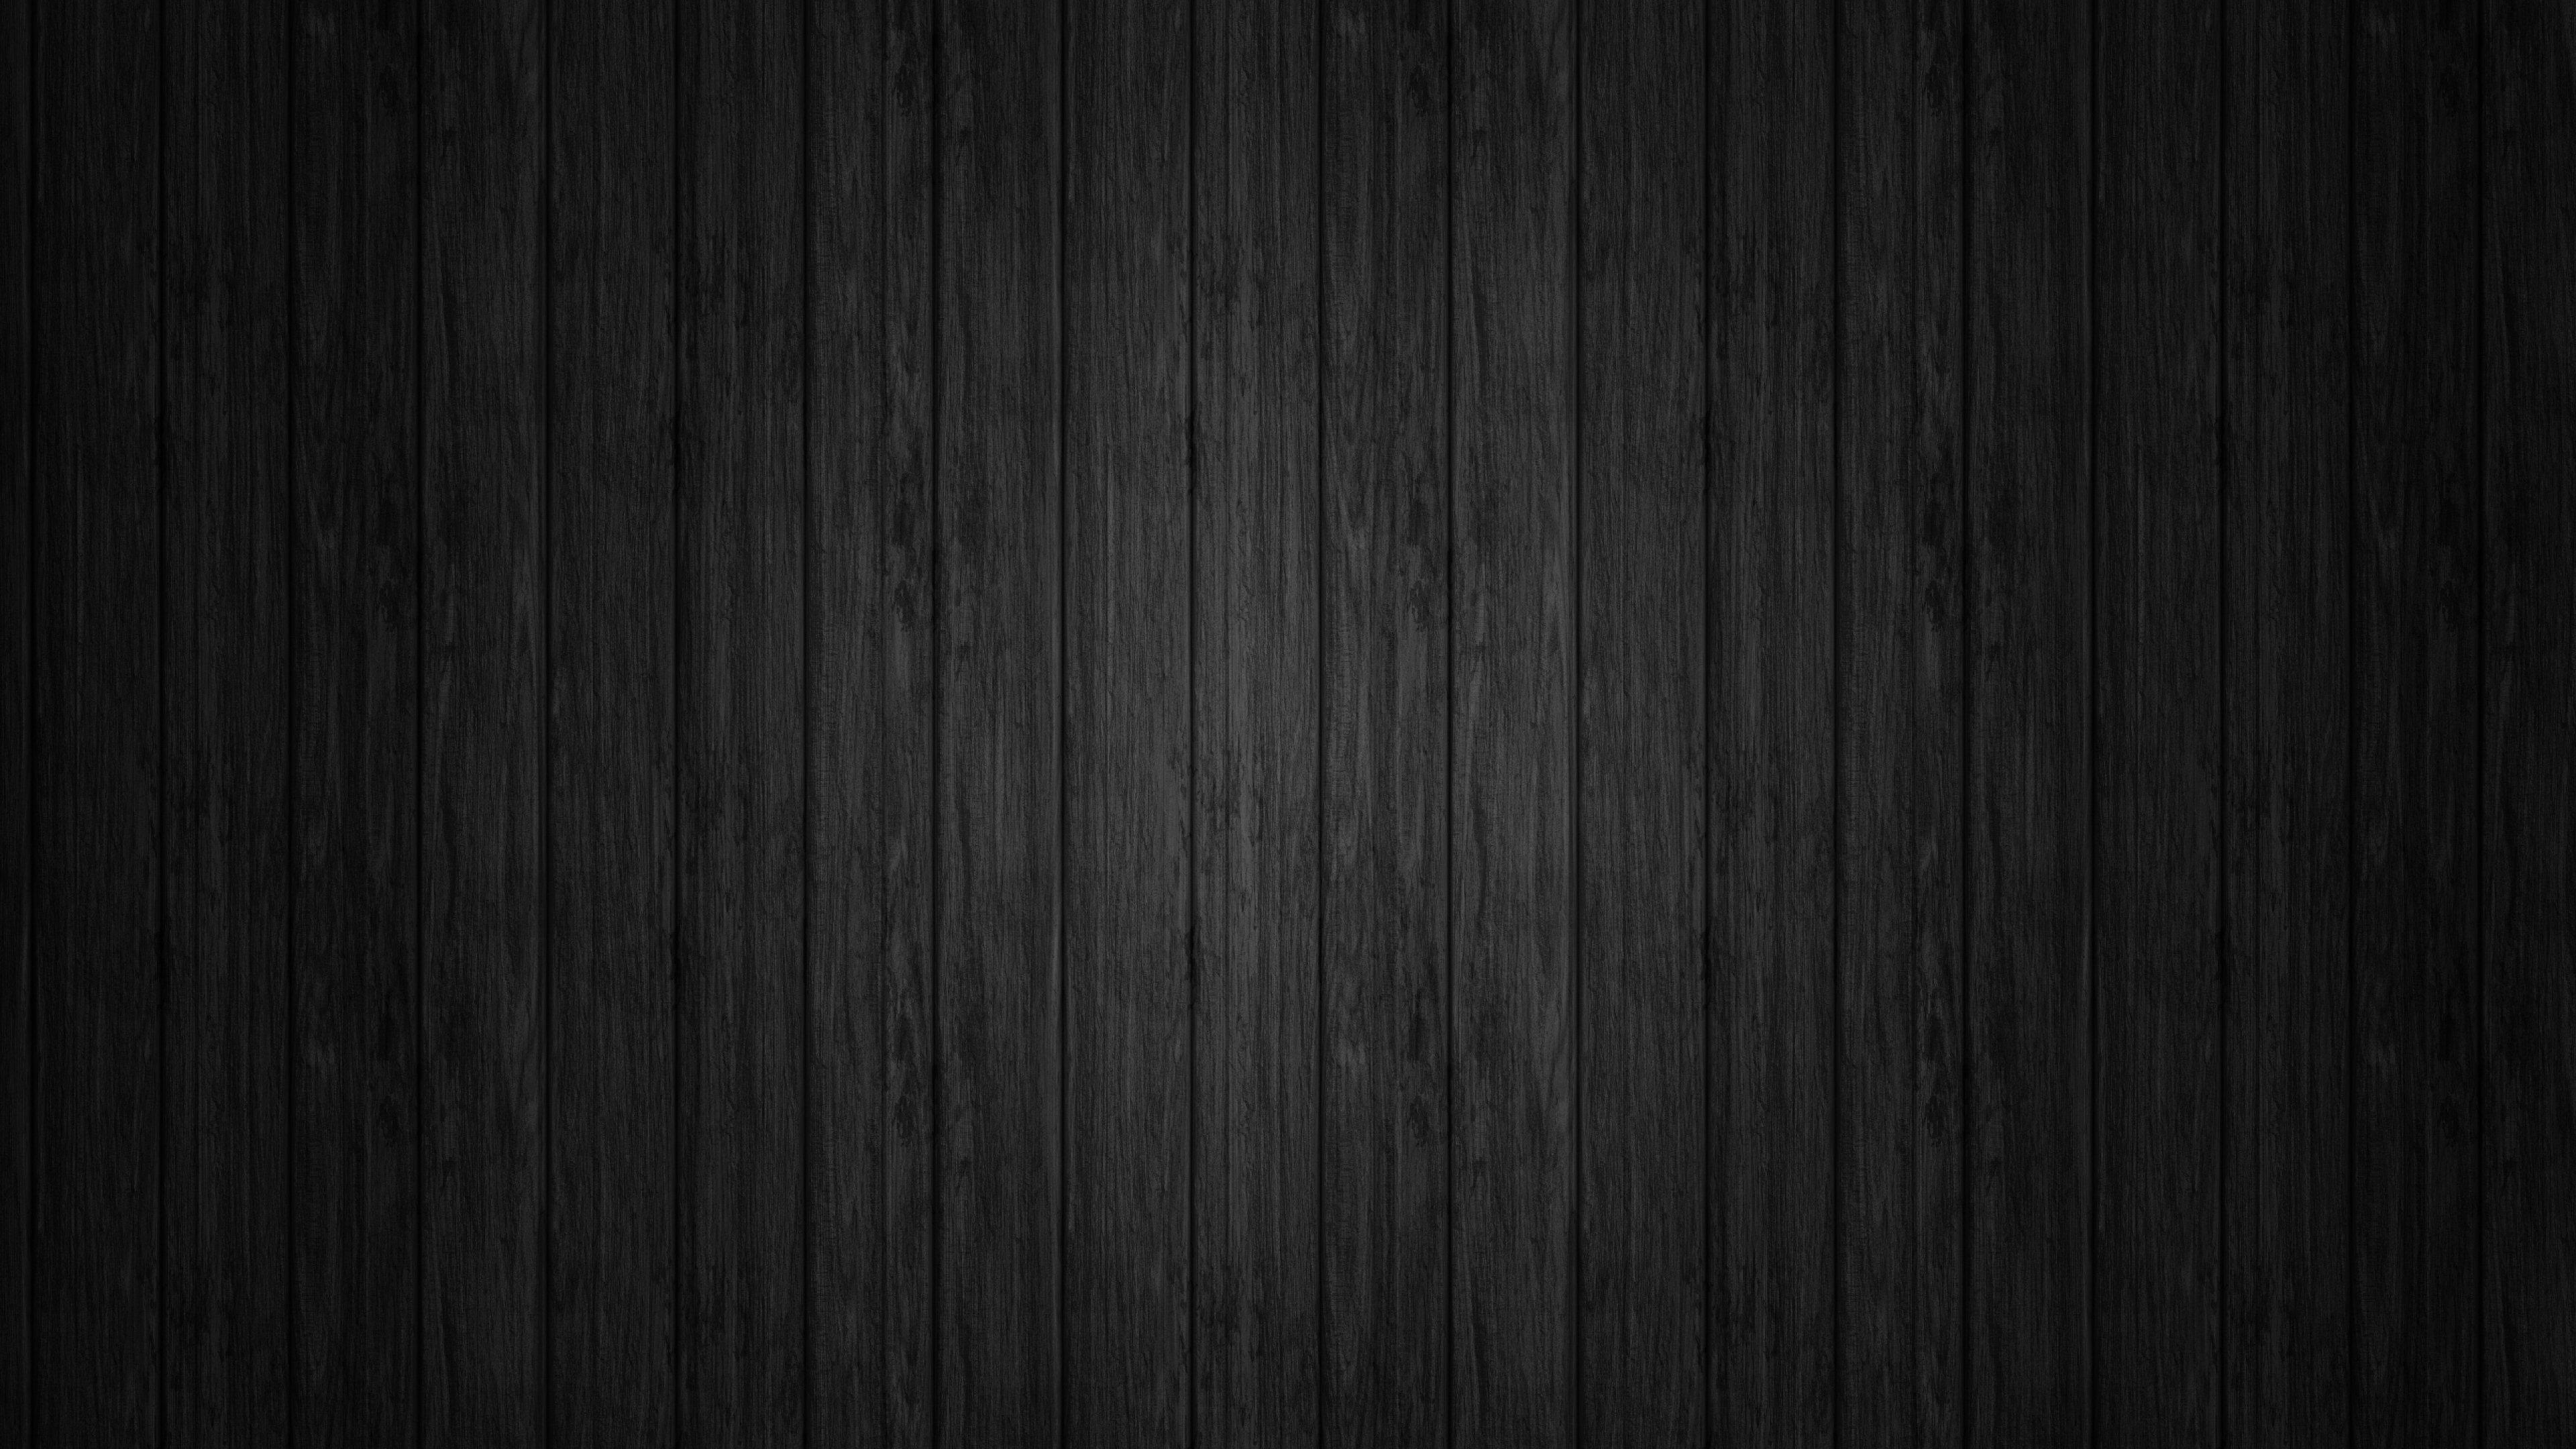 Wallpaper 3840x2160 board black line texture background wood 4K 3840x2160